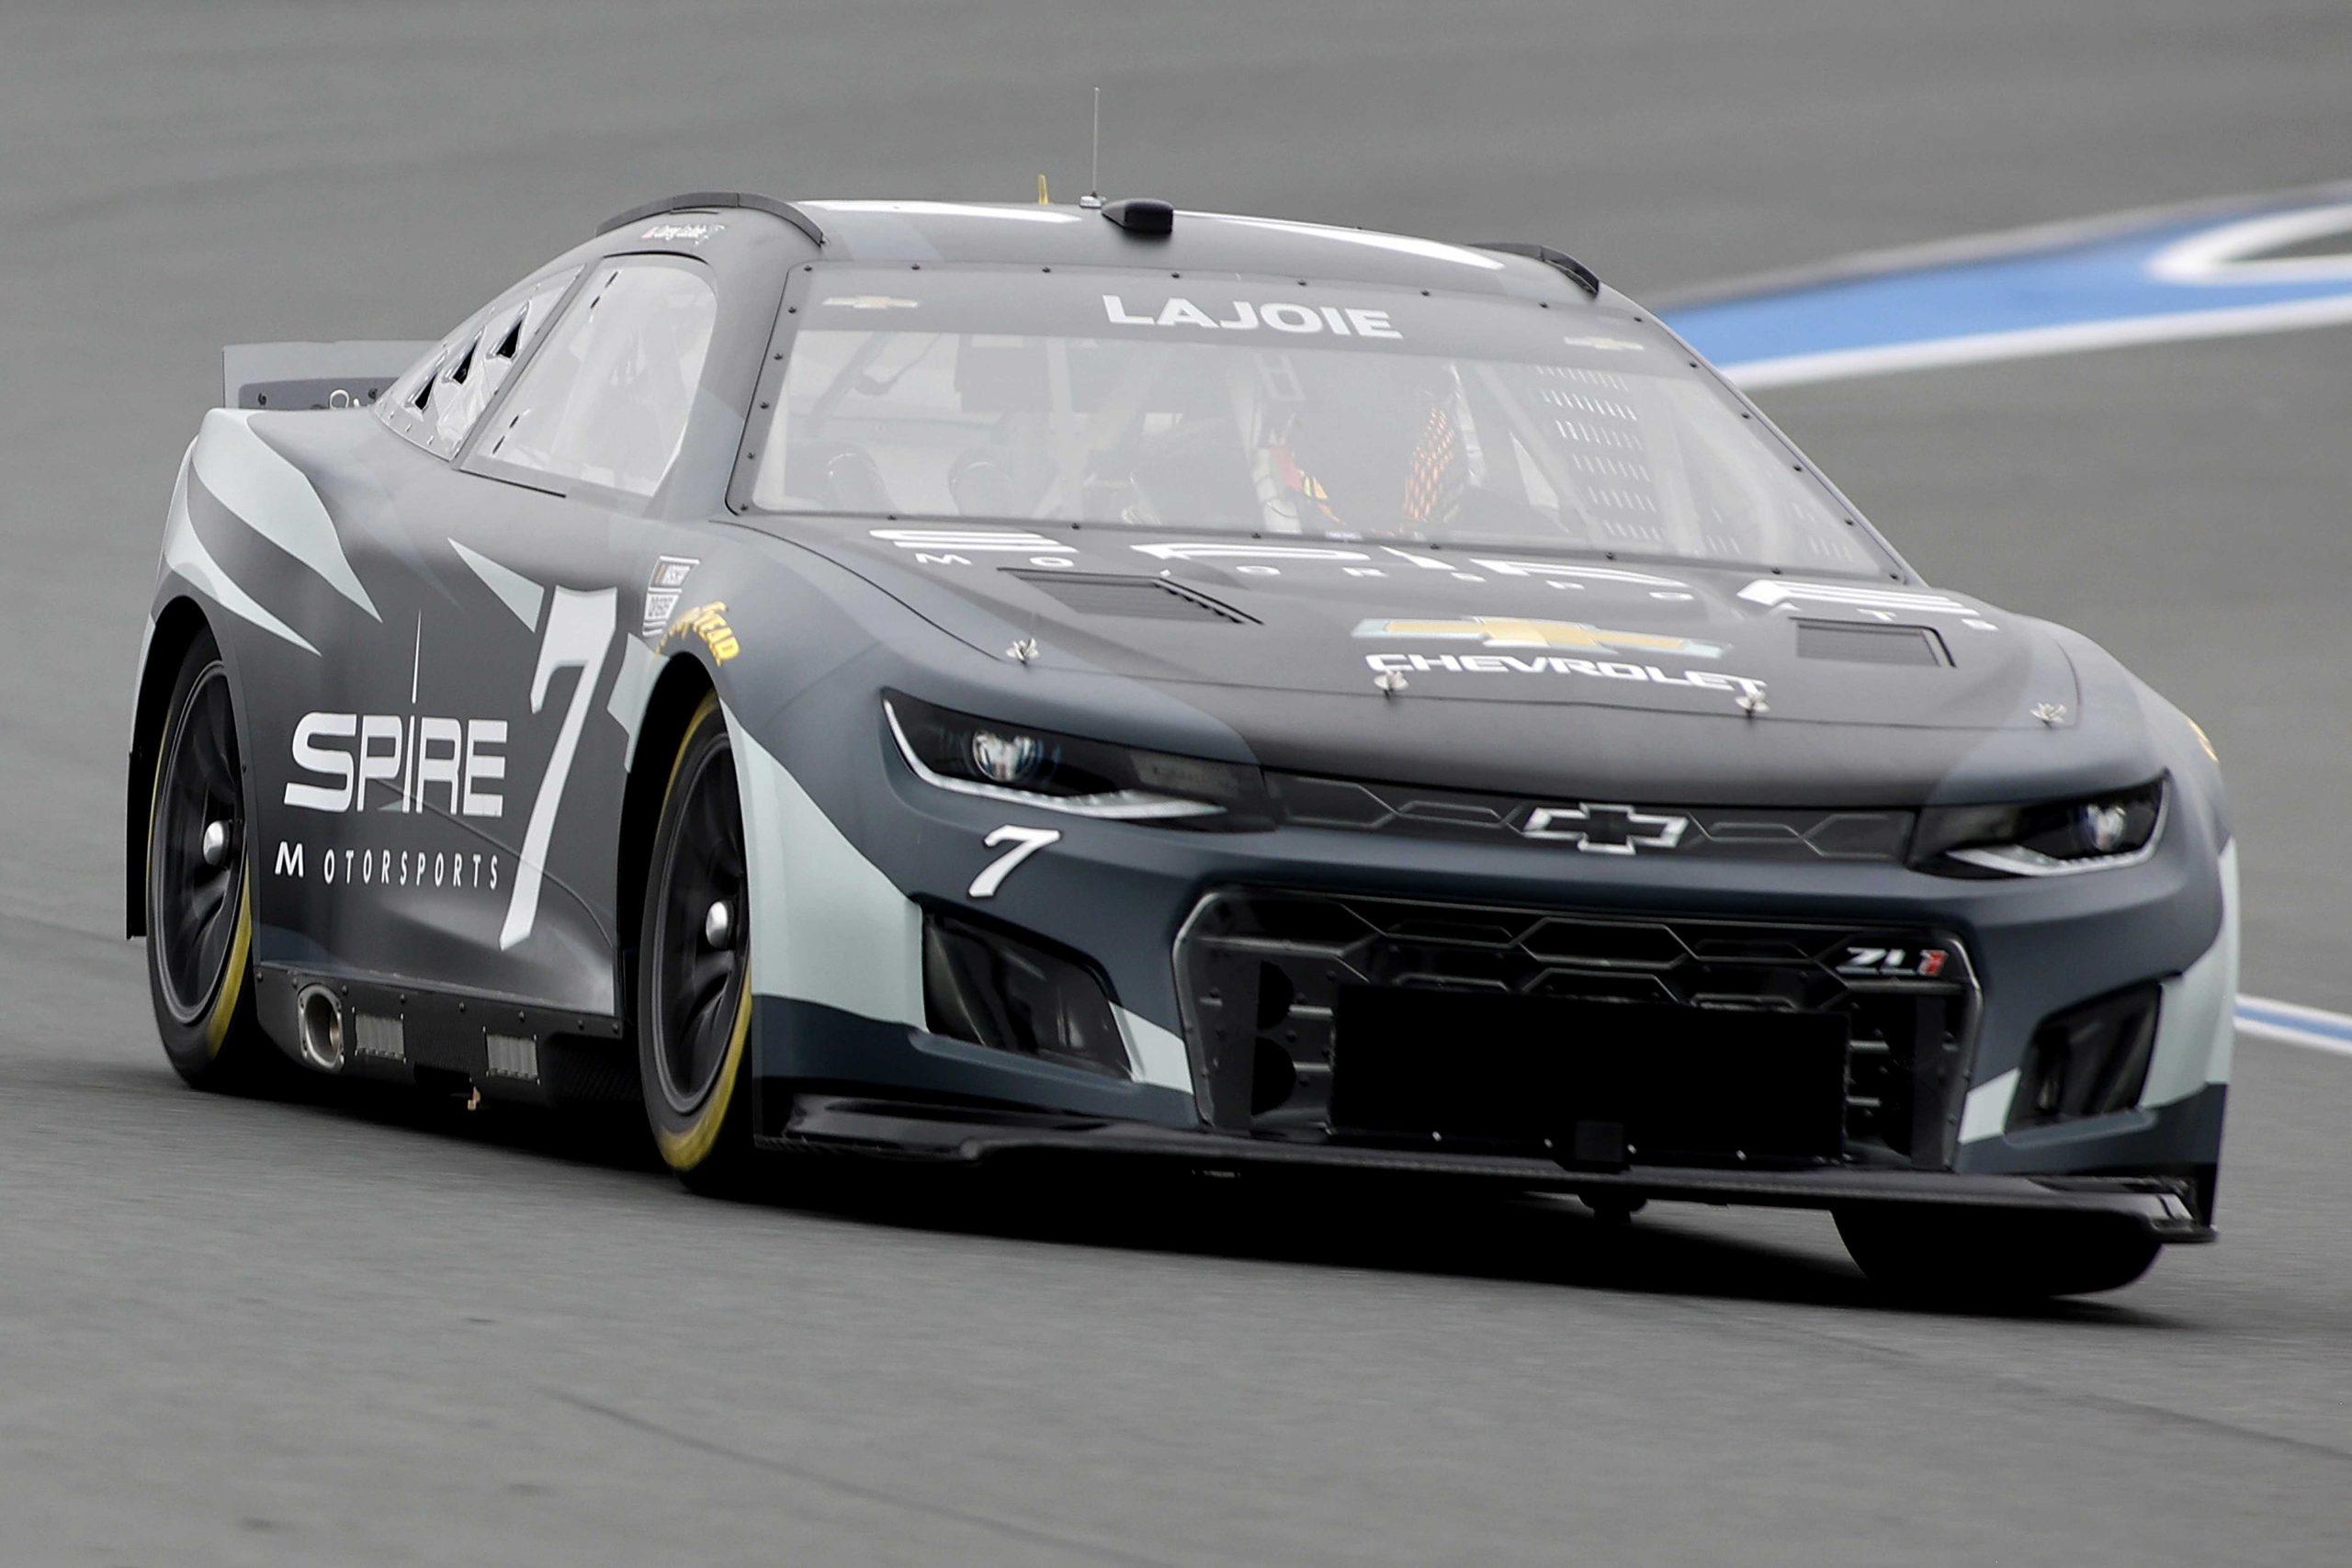 Octubre de 2021 (Charlotte ROVAL) -Racing